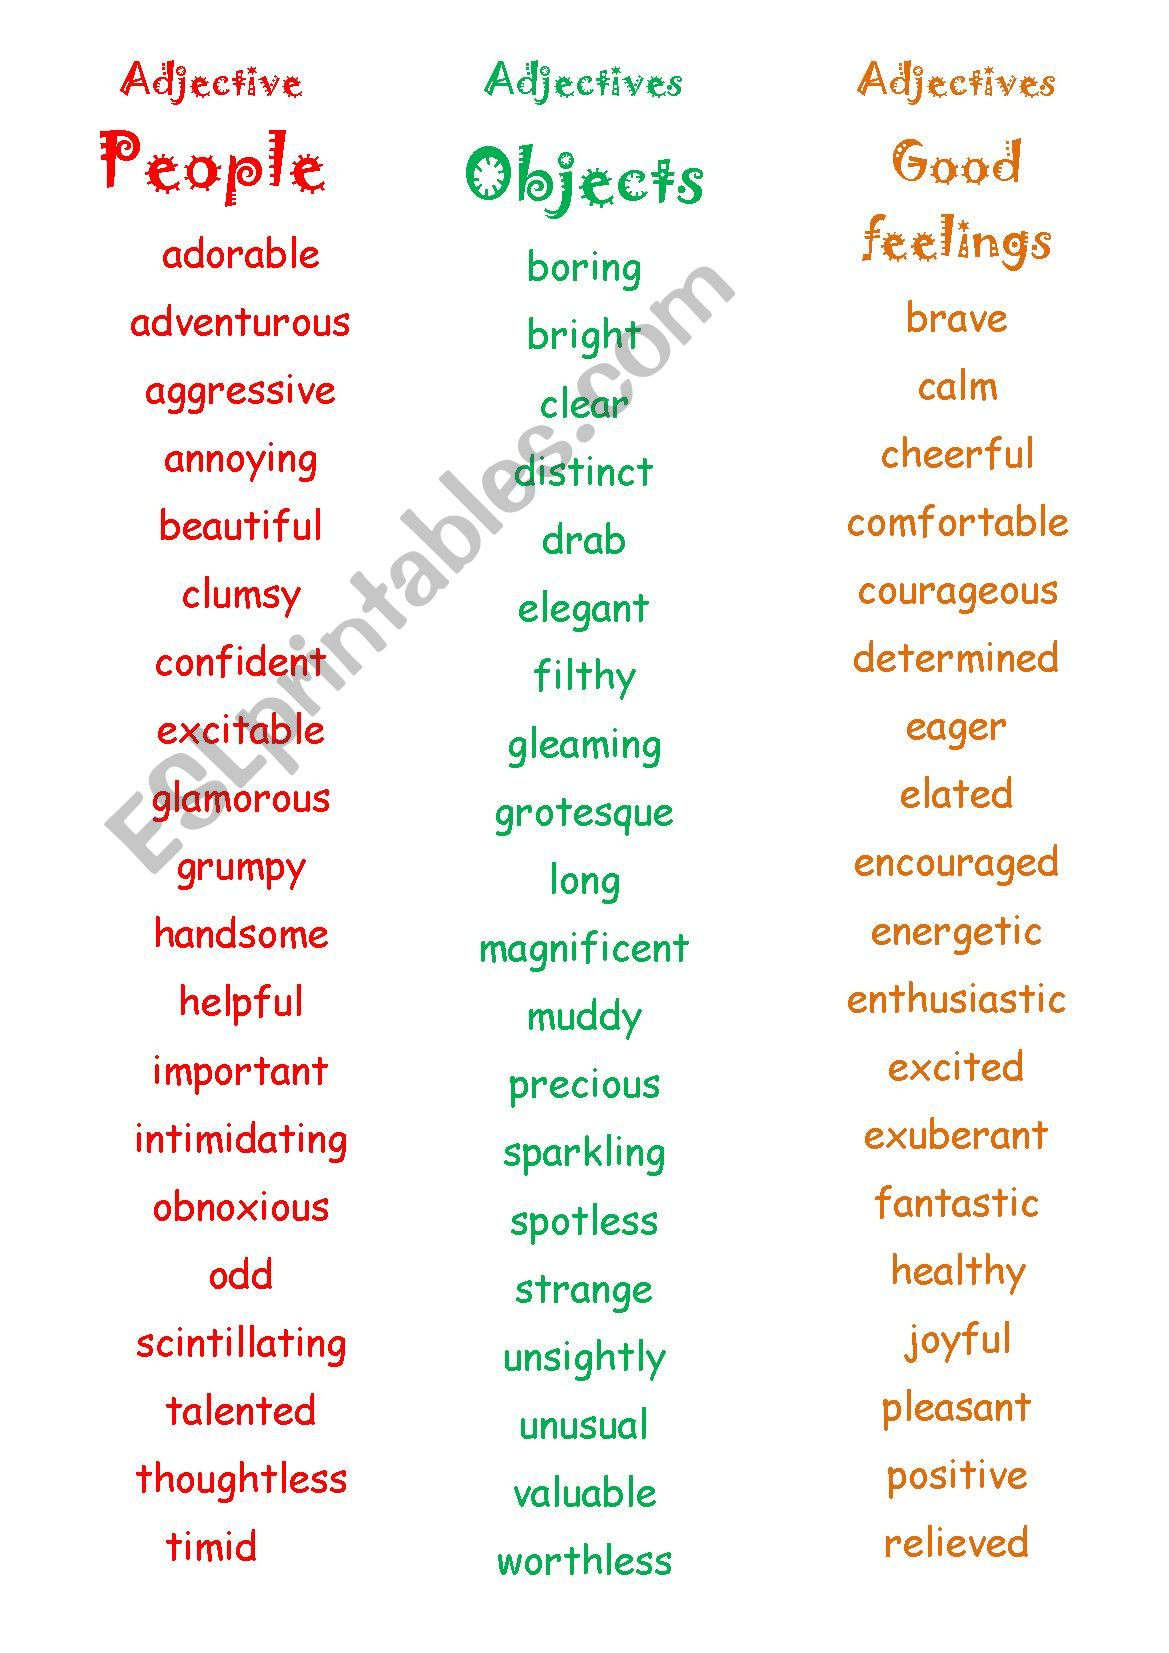 Intimidating adjectives